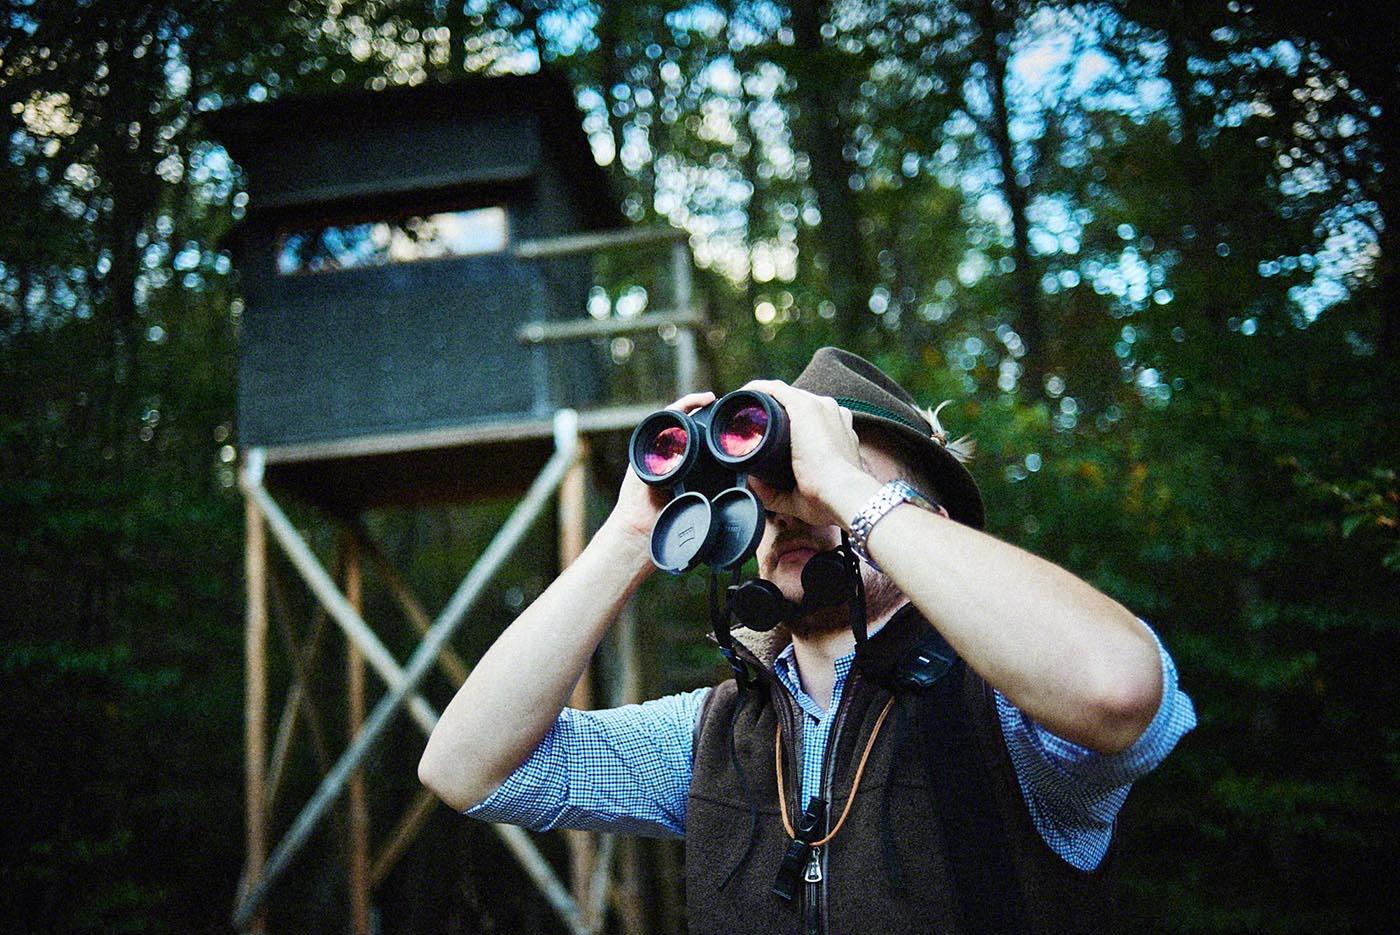 Jäger blickt durch Fernglas - Jagd-Reportage mit Sternekoch Harald und Maximilian Rüssel Fotos: neon fotografie